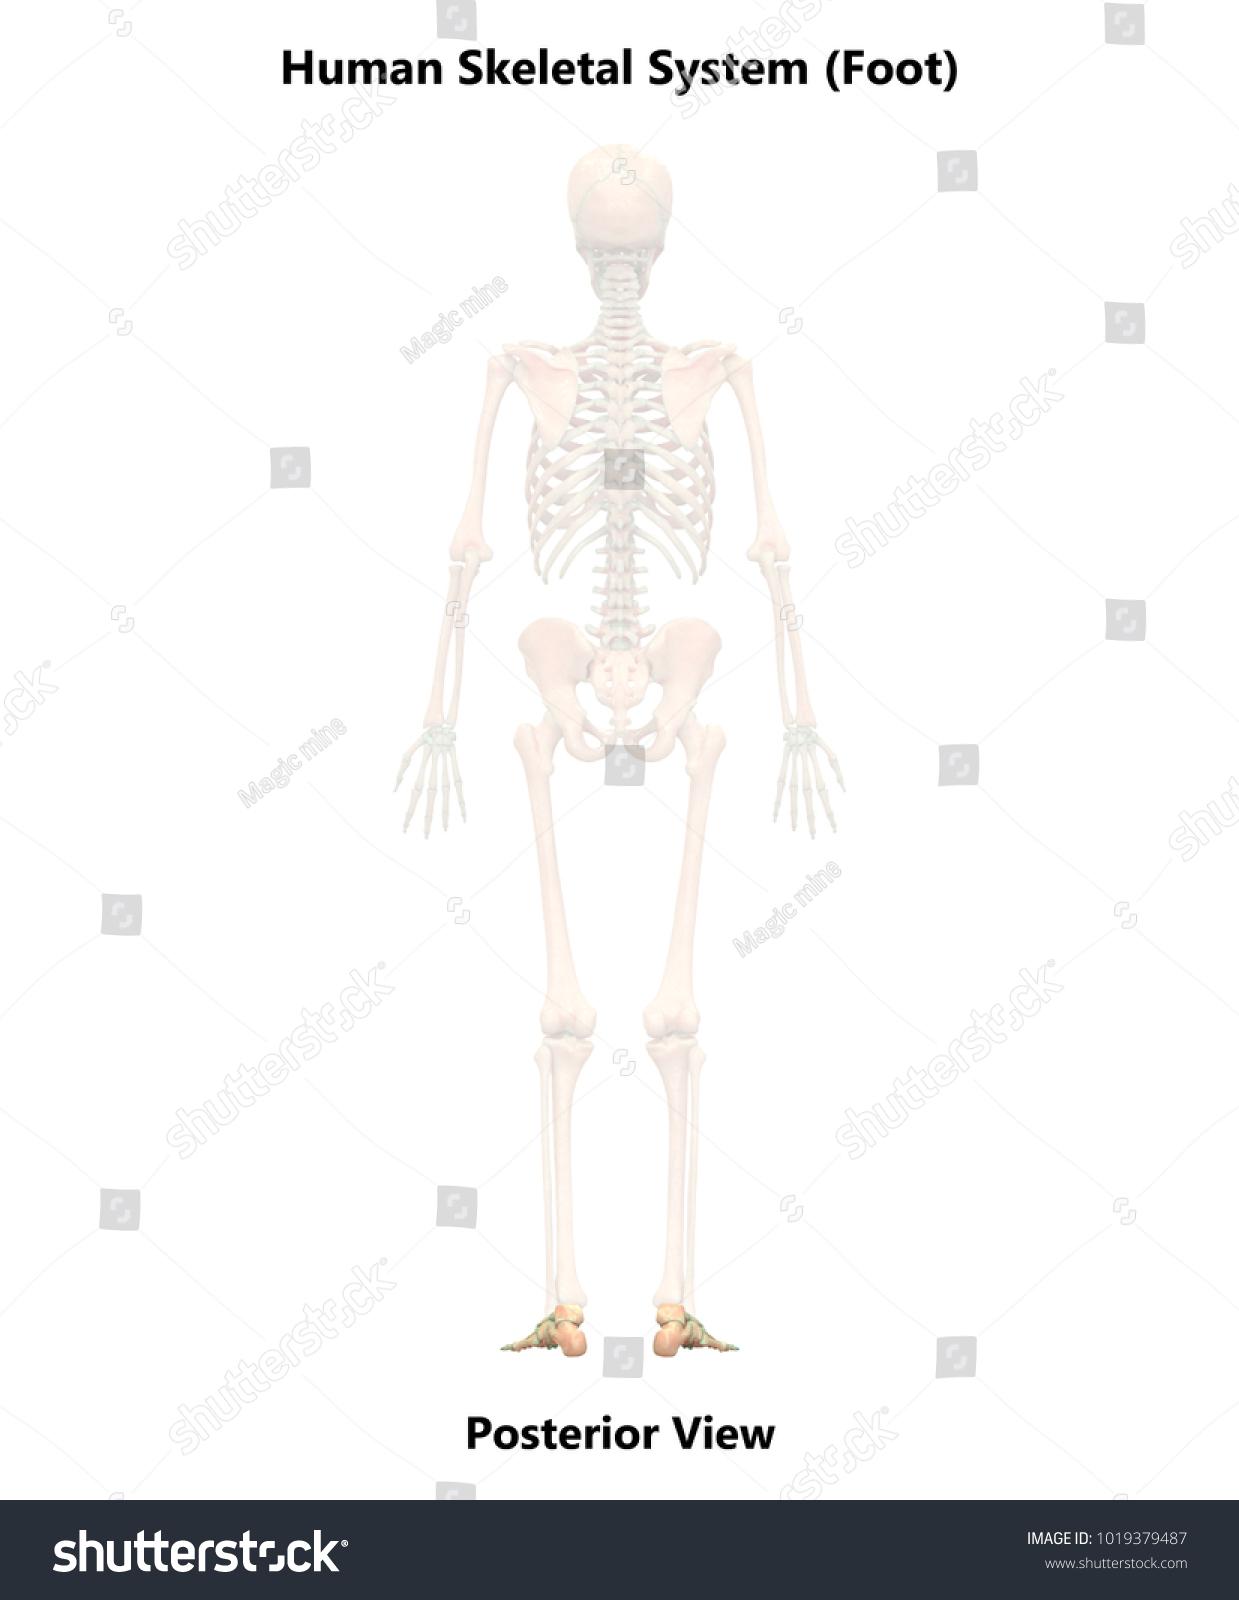 Human Skeleton System Foot Joints Anatomy Stock Illustration ...